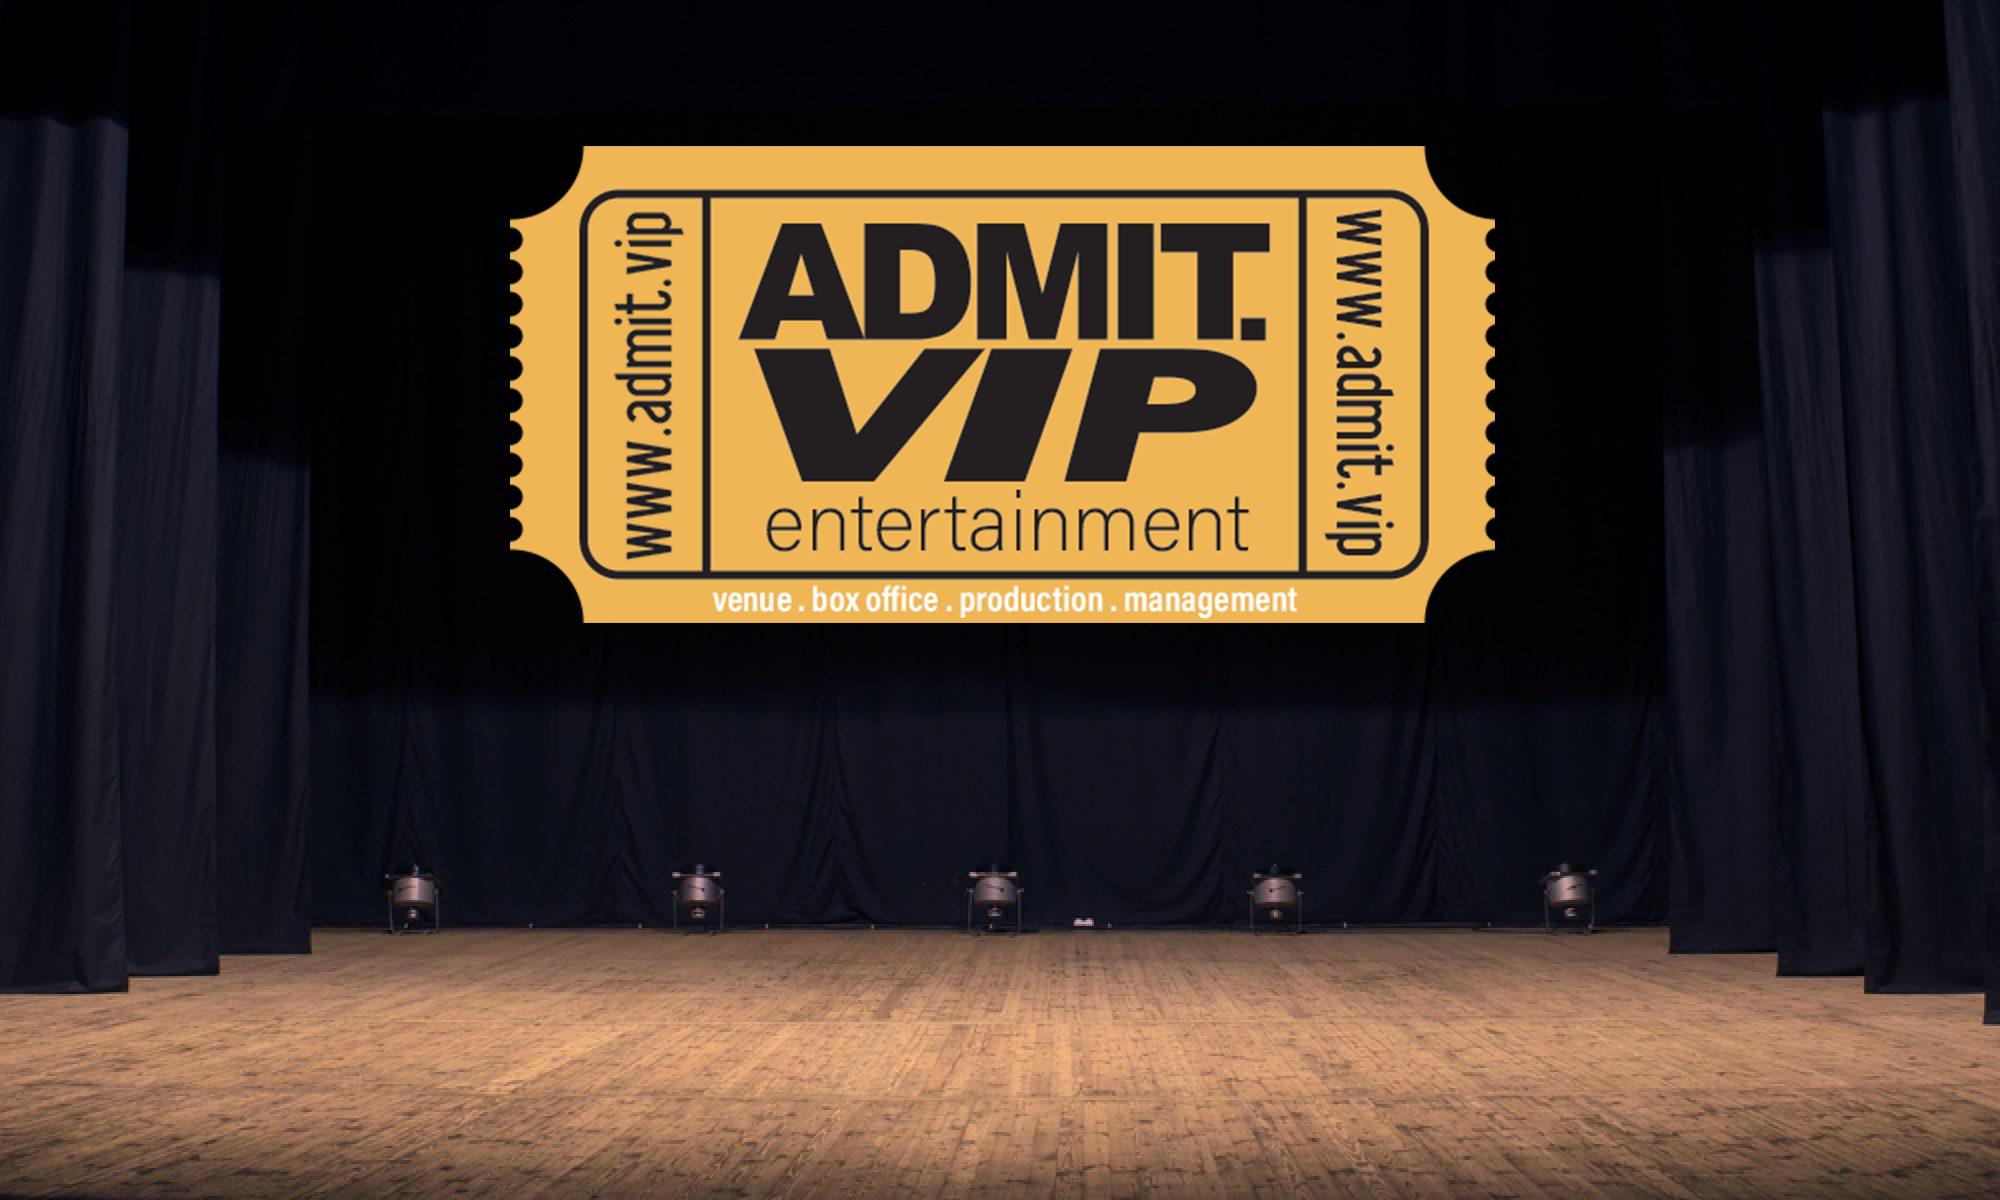 Admit VIP